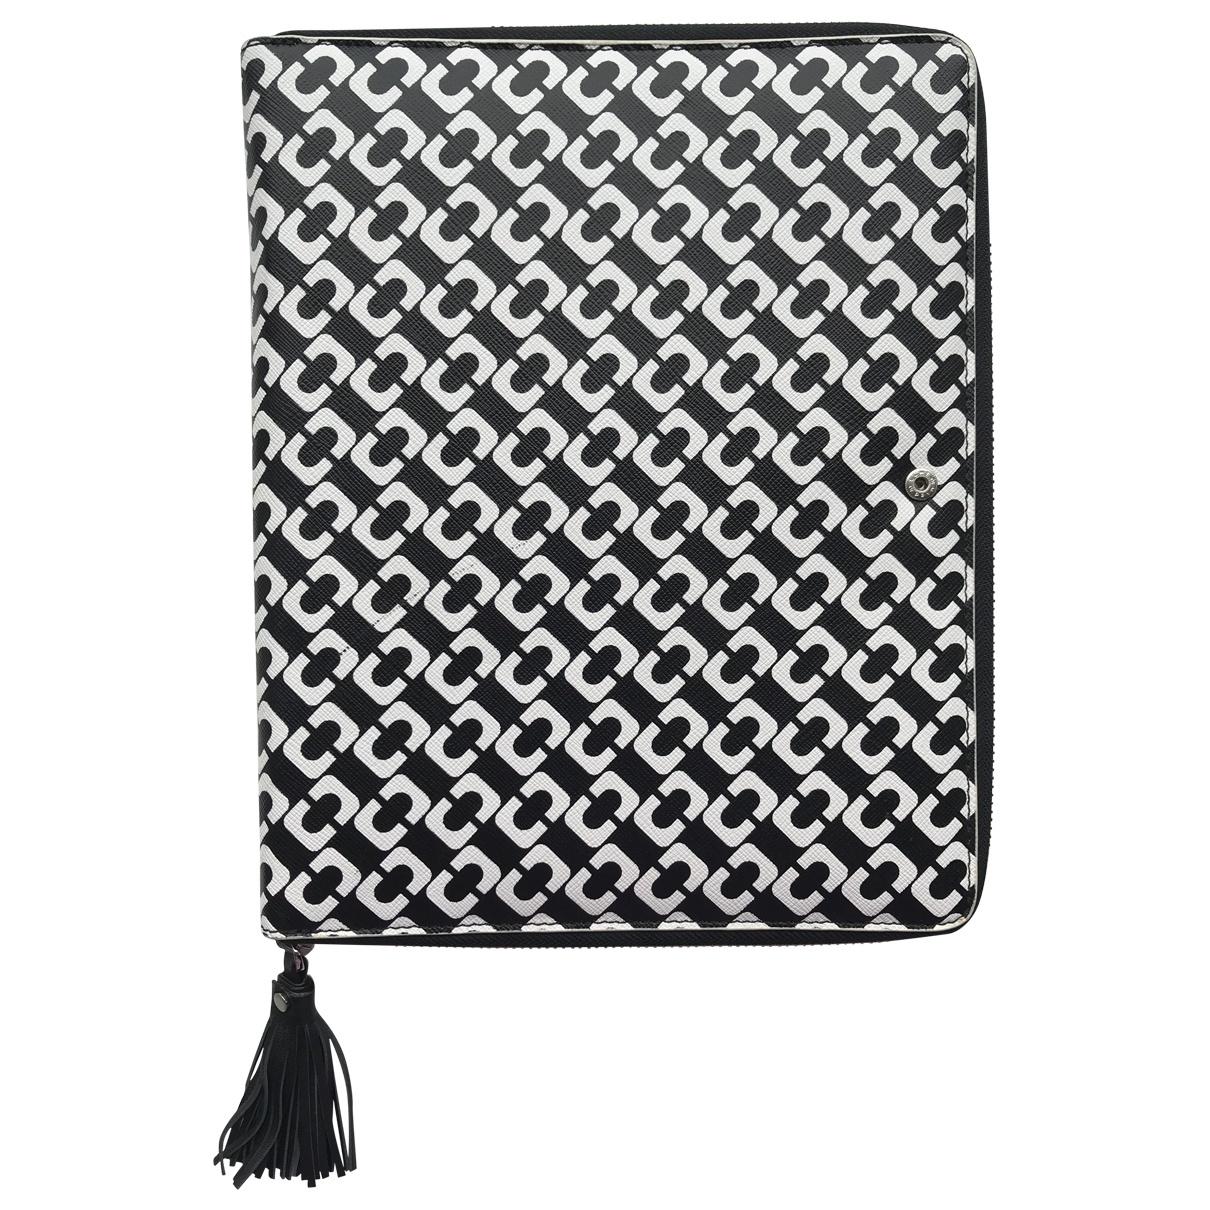 Diane Von Furstenberg \N Black Leather Accessories for Life & Living \N